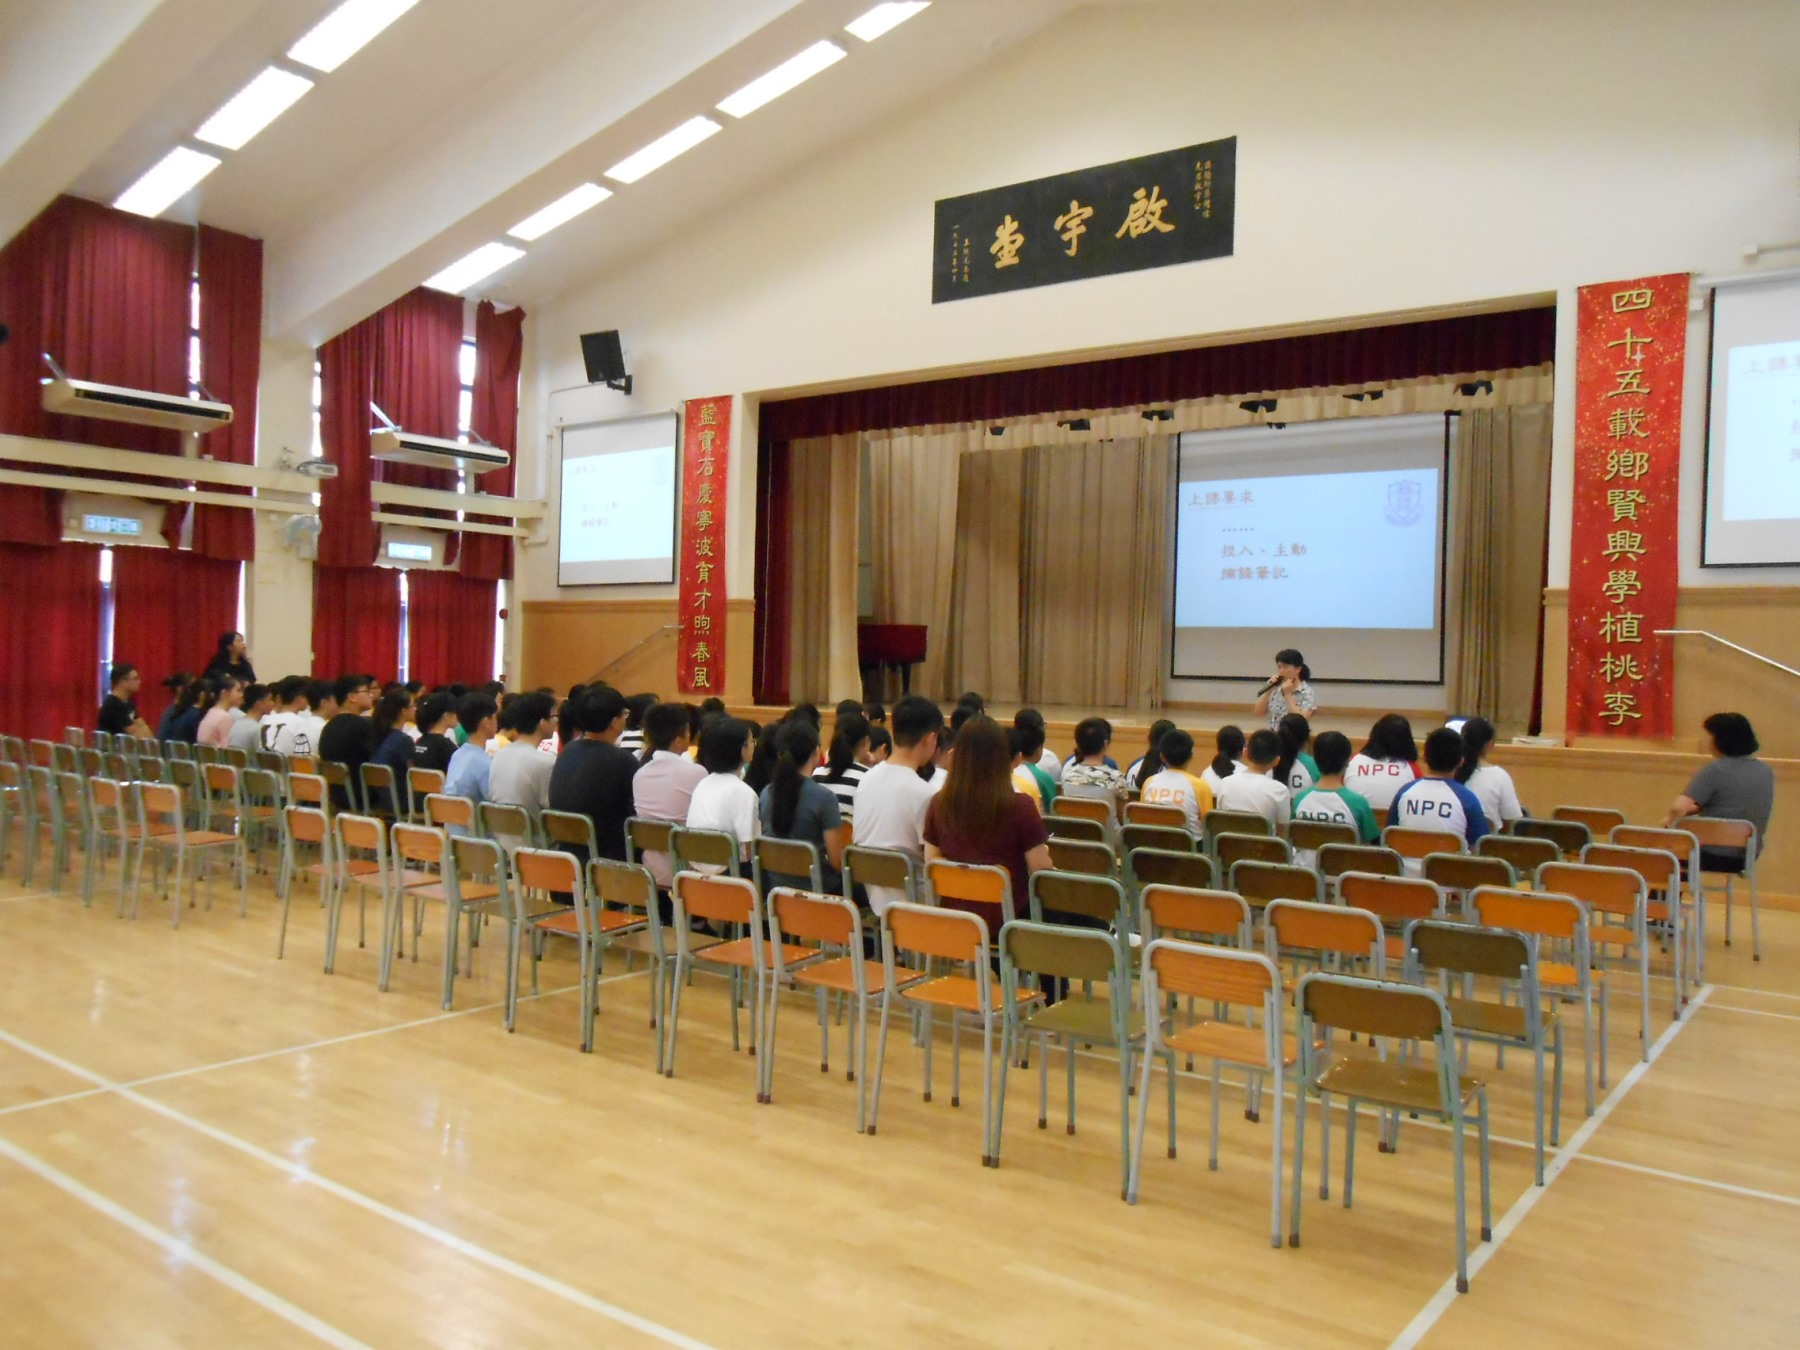 https://www.npc.edu.hk/sites/default/files/dscn9617.jpg